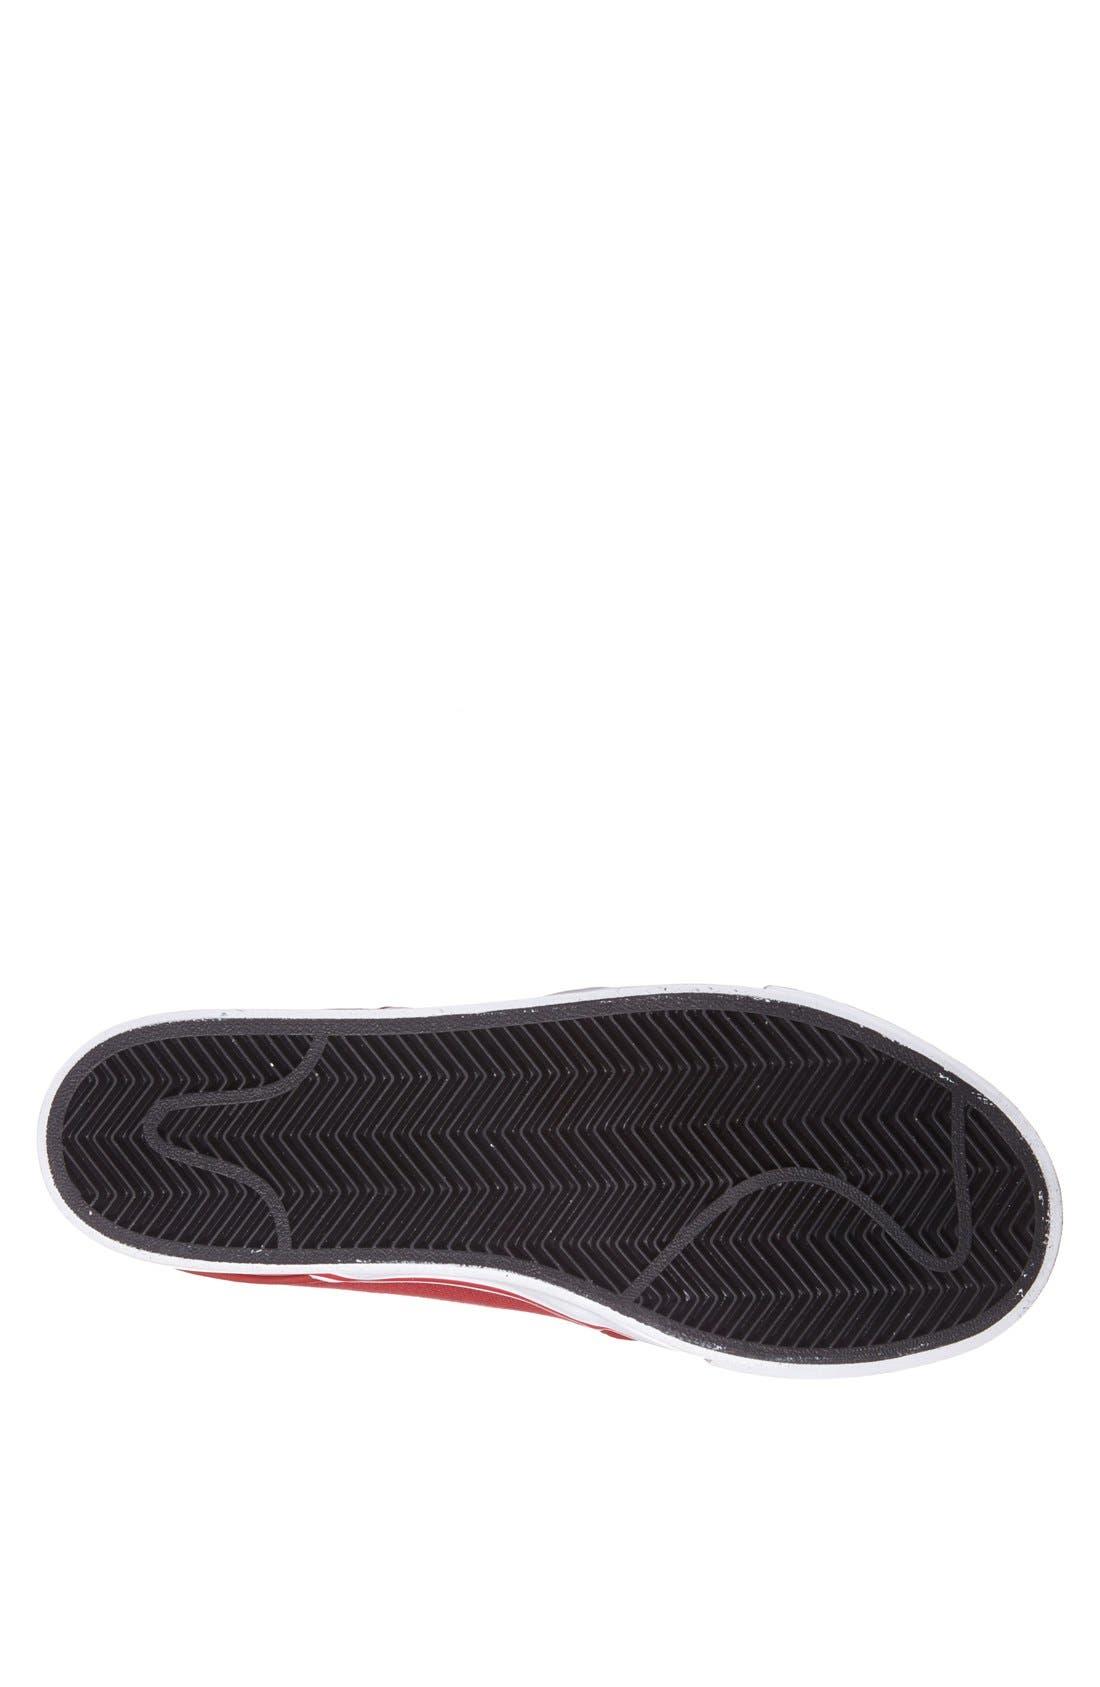 Zoom - Stefan Janoski SB Canvas Skate Shoe,                             Alternate thumbnail 169, color,